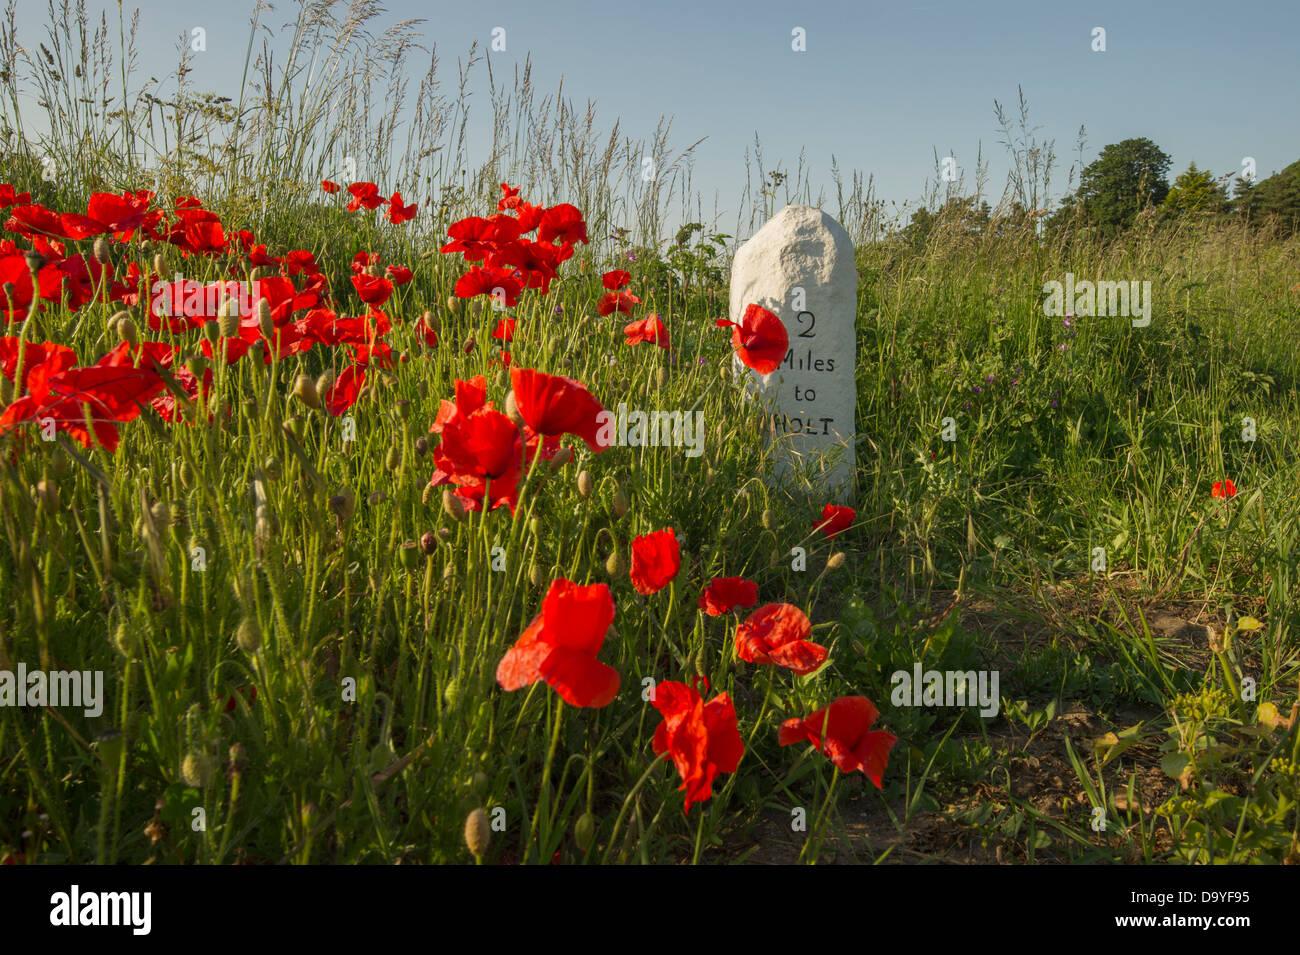 Poppies surrounding an old roadside milestone. - Stock Image